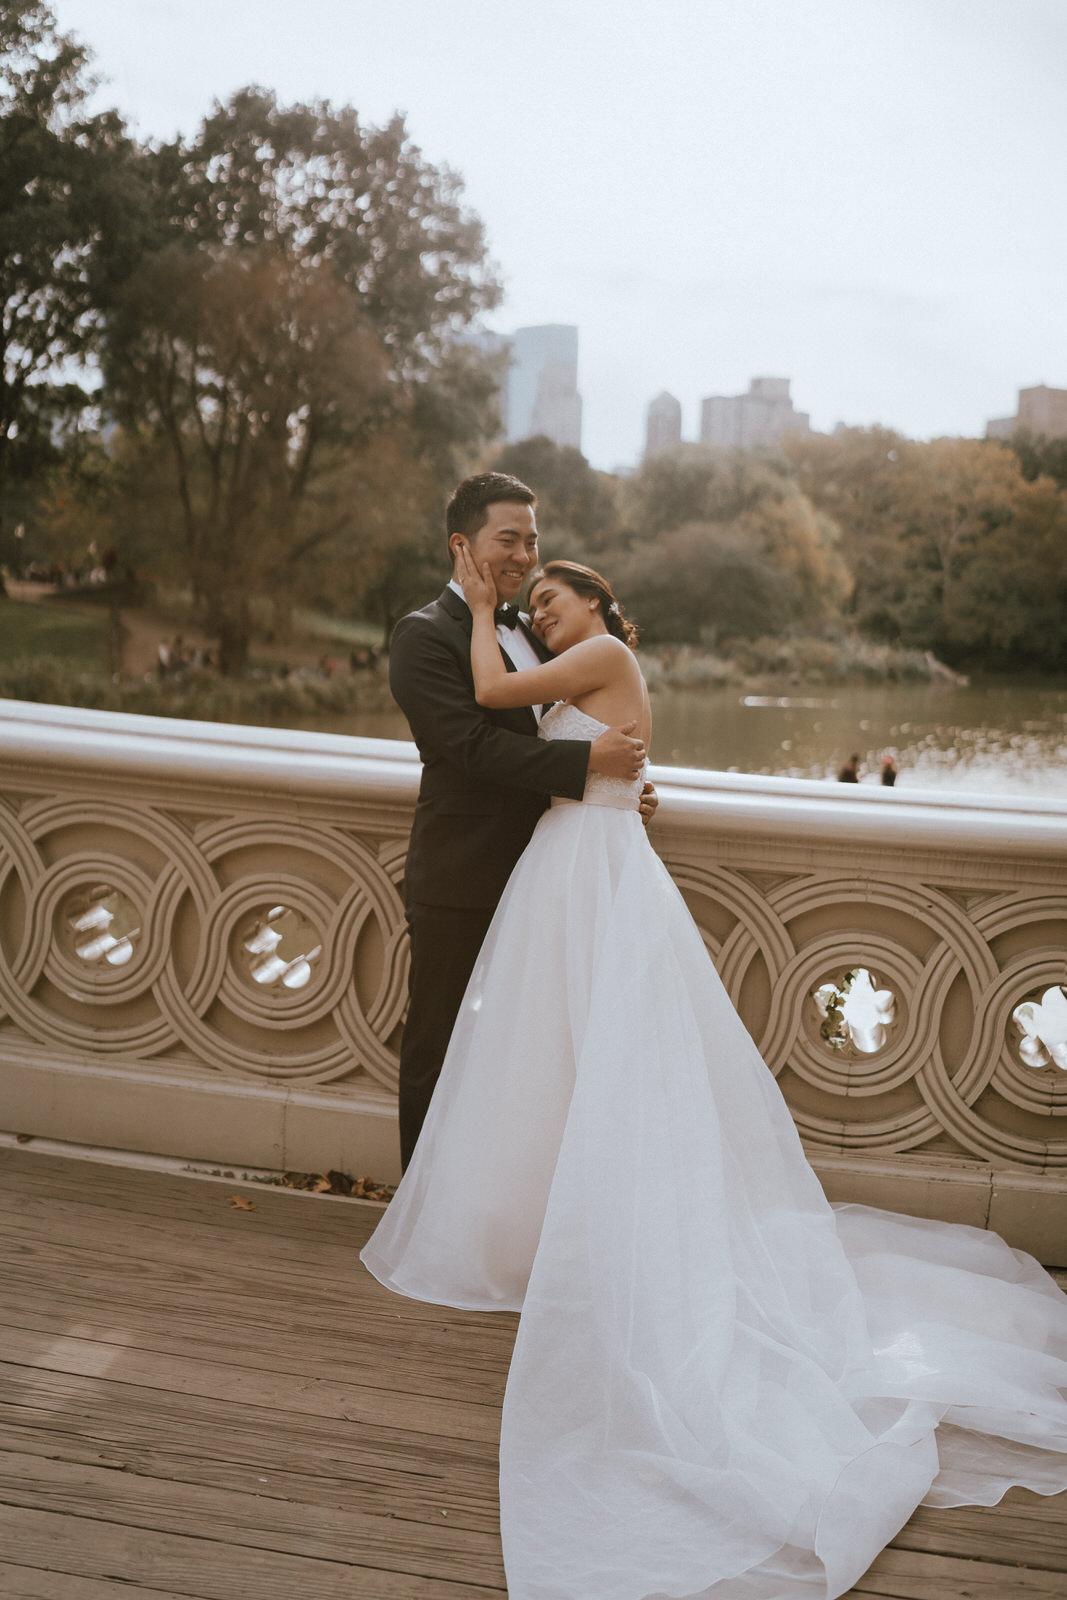 Central Park Elopement Photos-Bow Bridge-Michelle Gonzalez Photography- New York Wedding Photographer-28.jpg